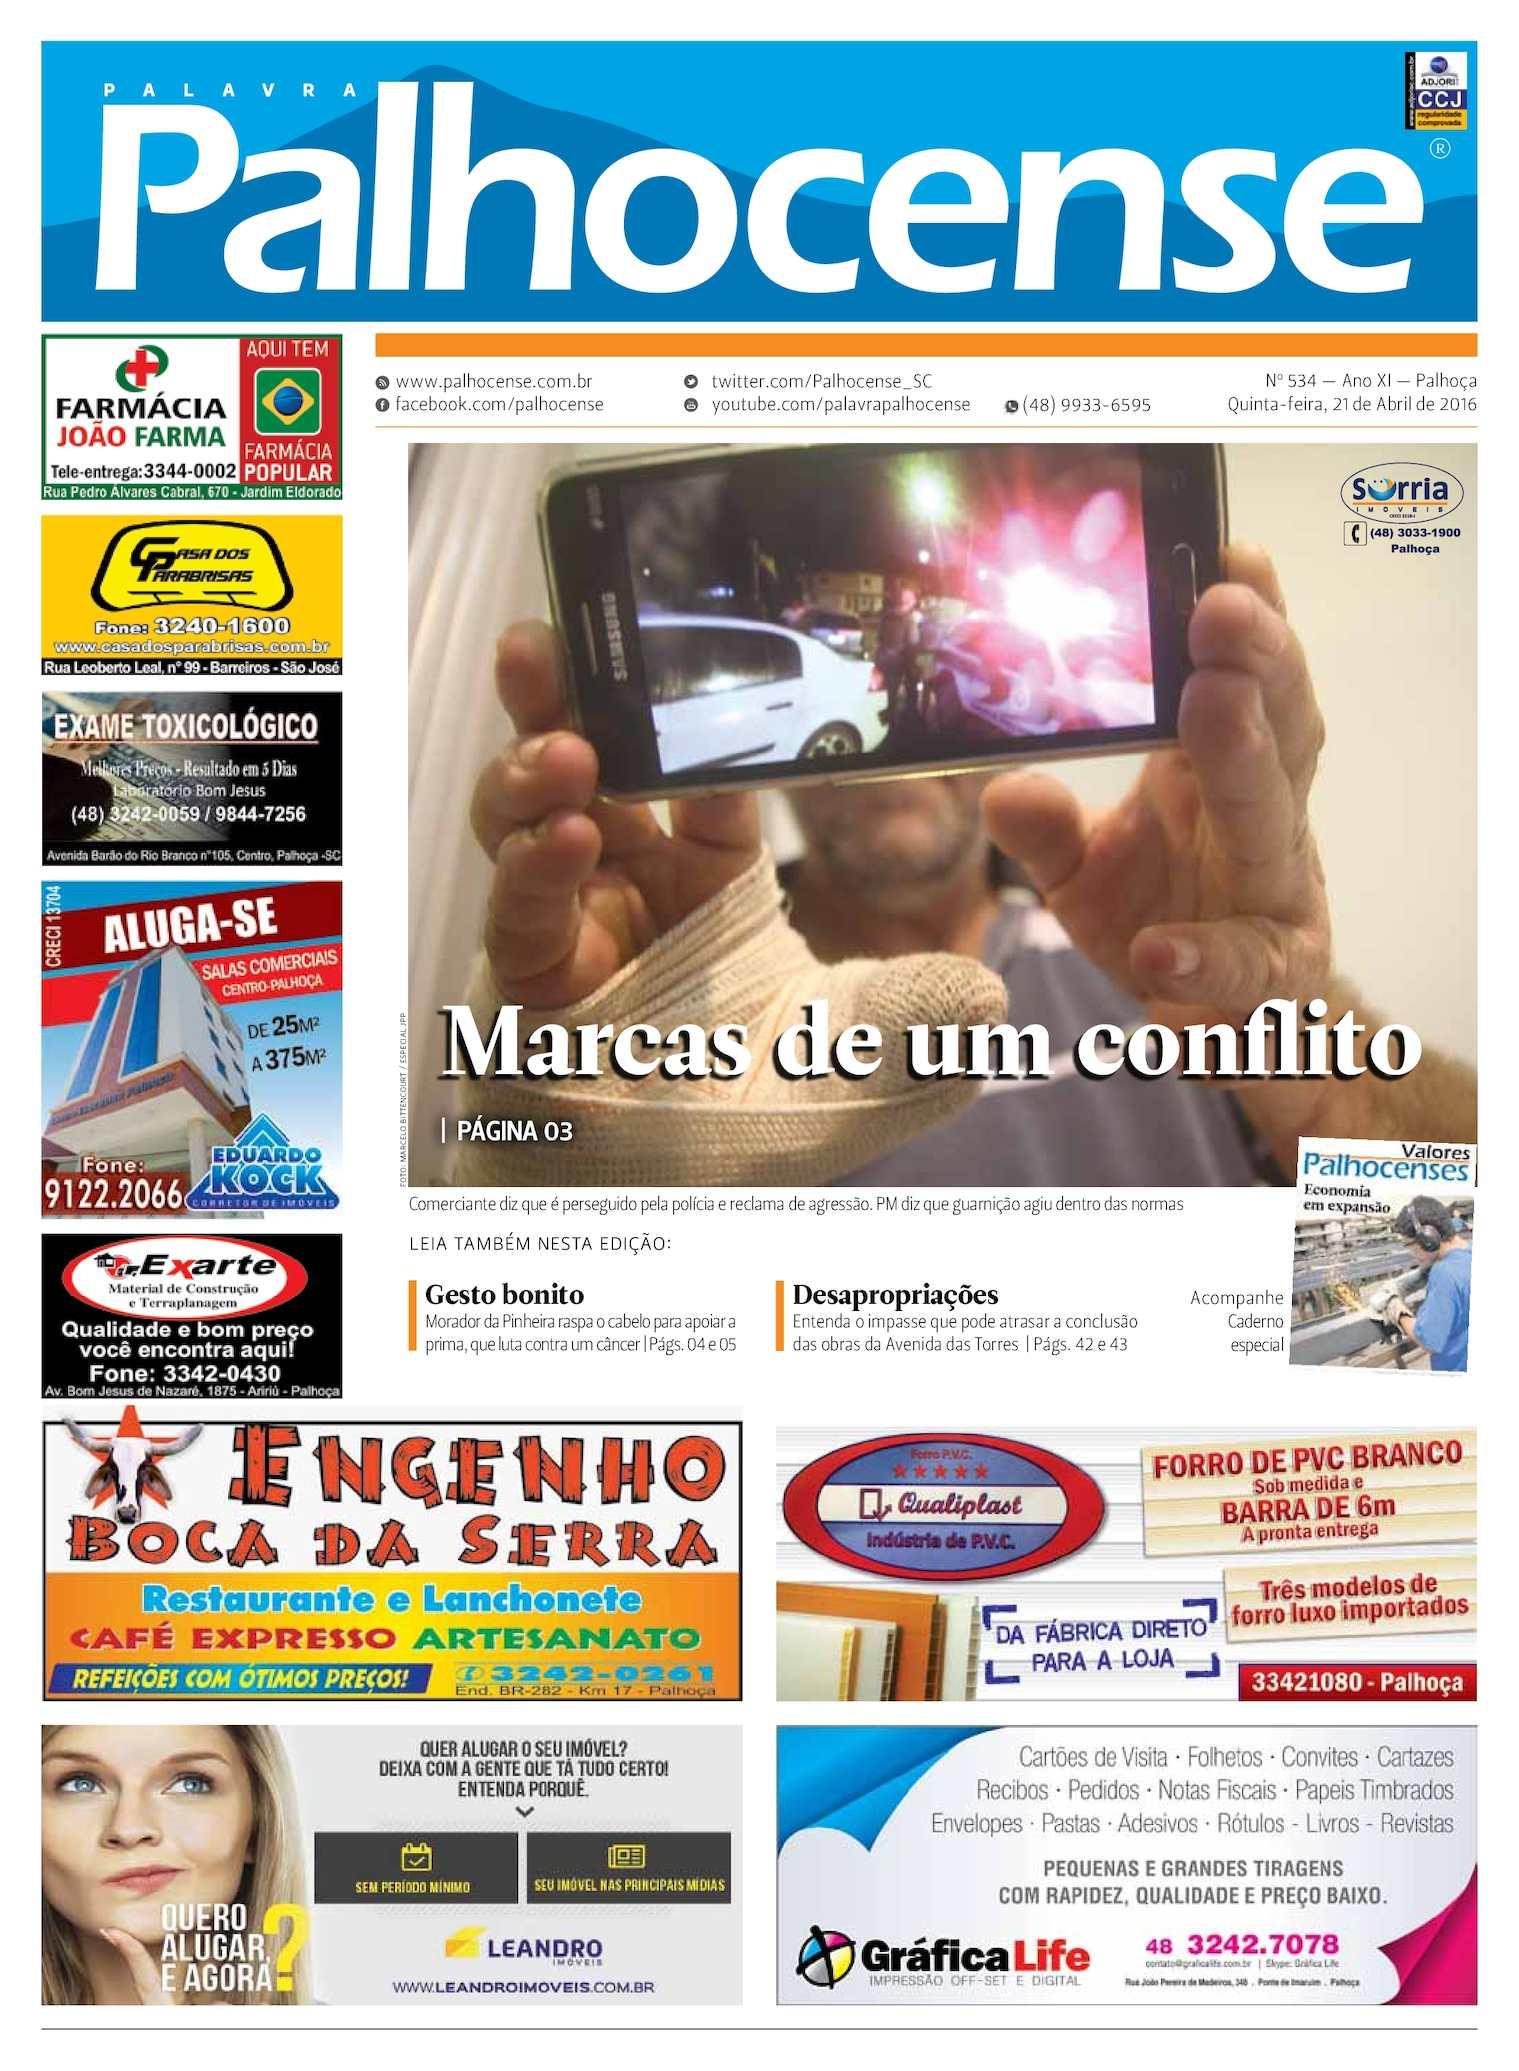 Calaméo - Jornal Palavra Palhocense - EDIÇÃO 534 df0840efb3